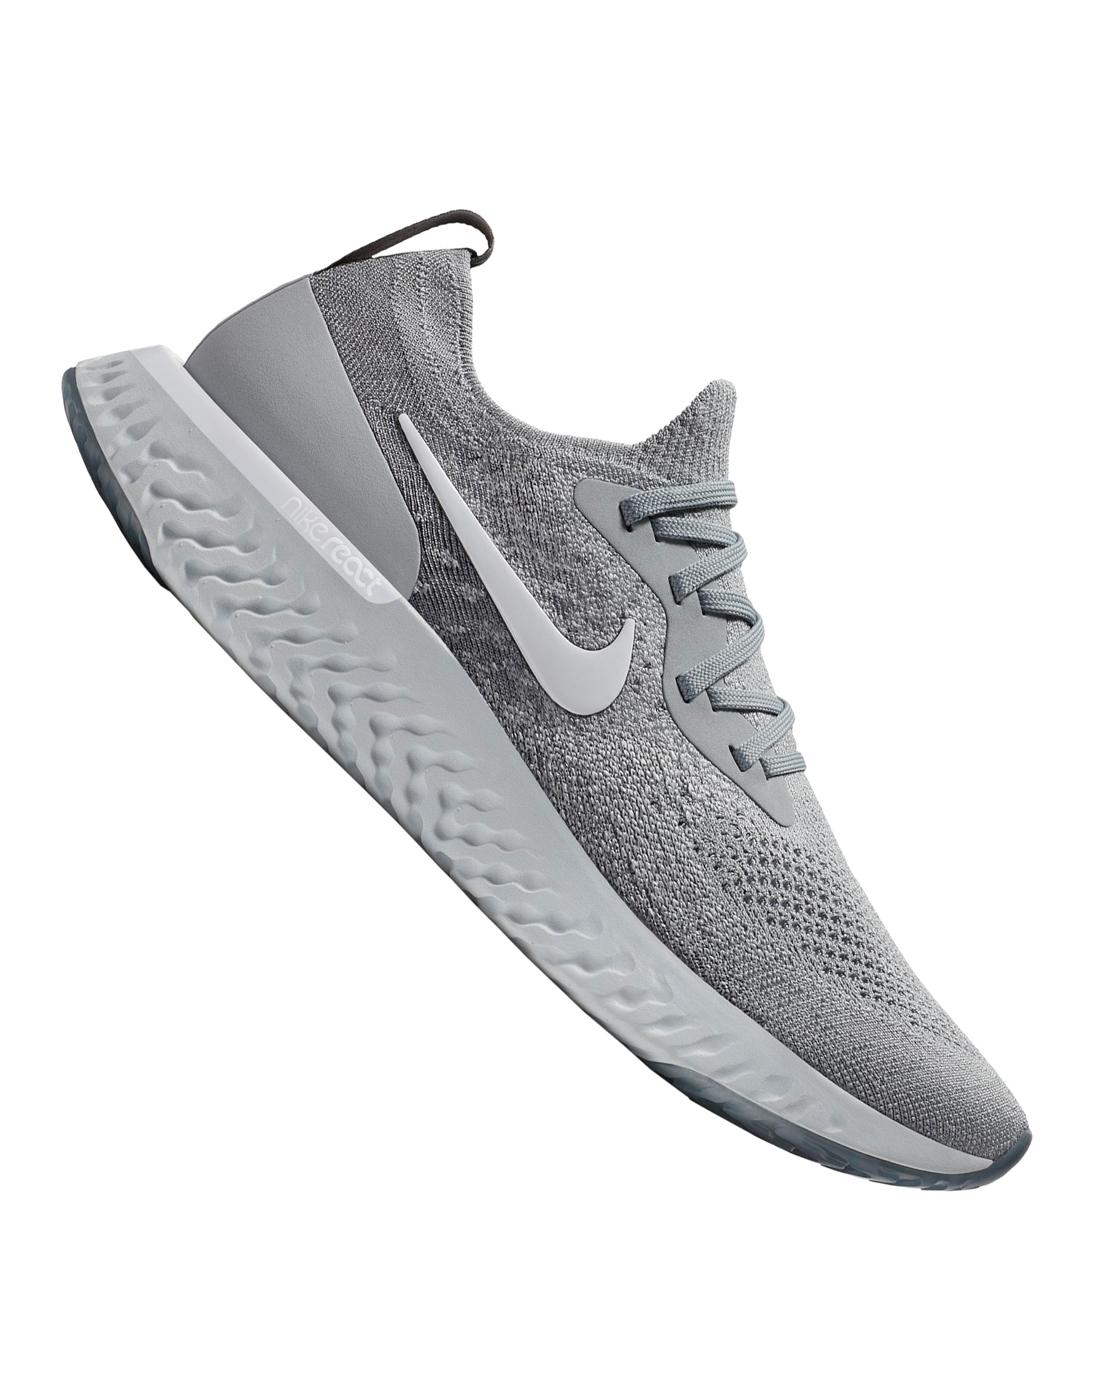 a517fc8abfc8 Men s Grey Nike Epic React Flyknit